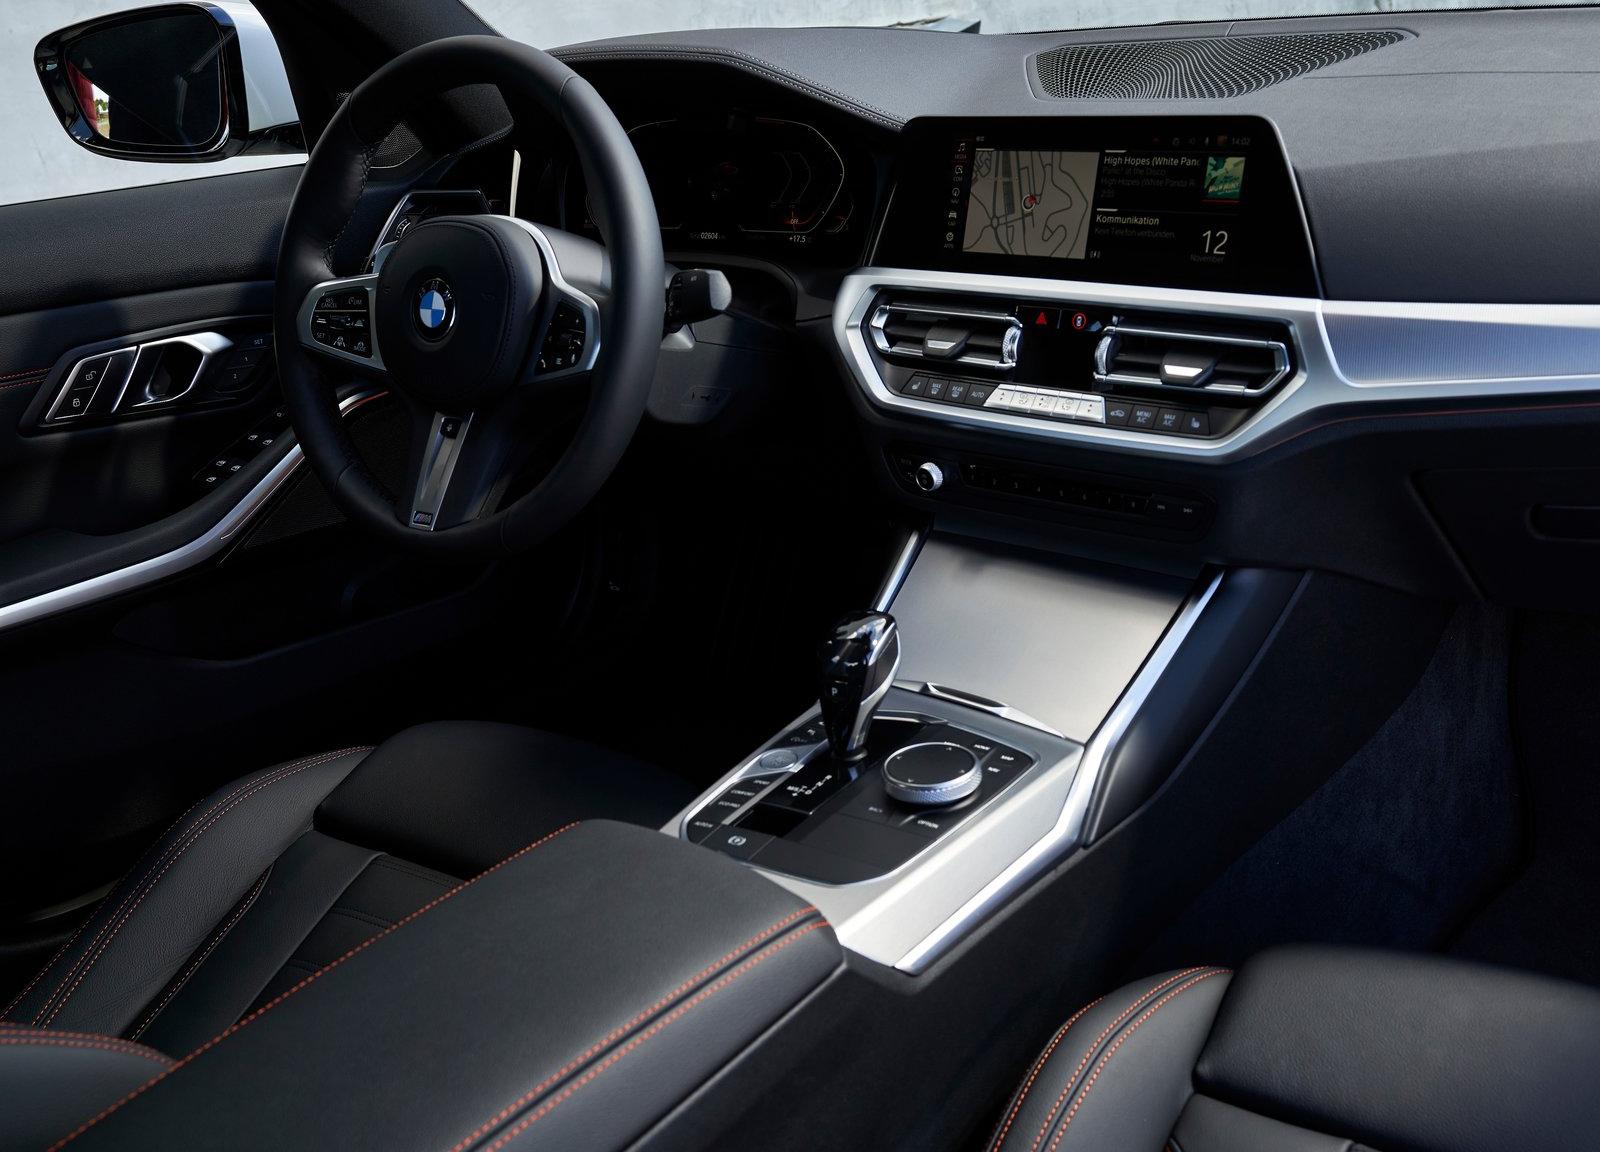 galer u00eda revista de coches  - interior bmw 320d sport line 2019